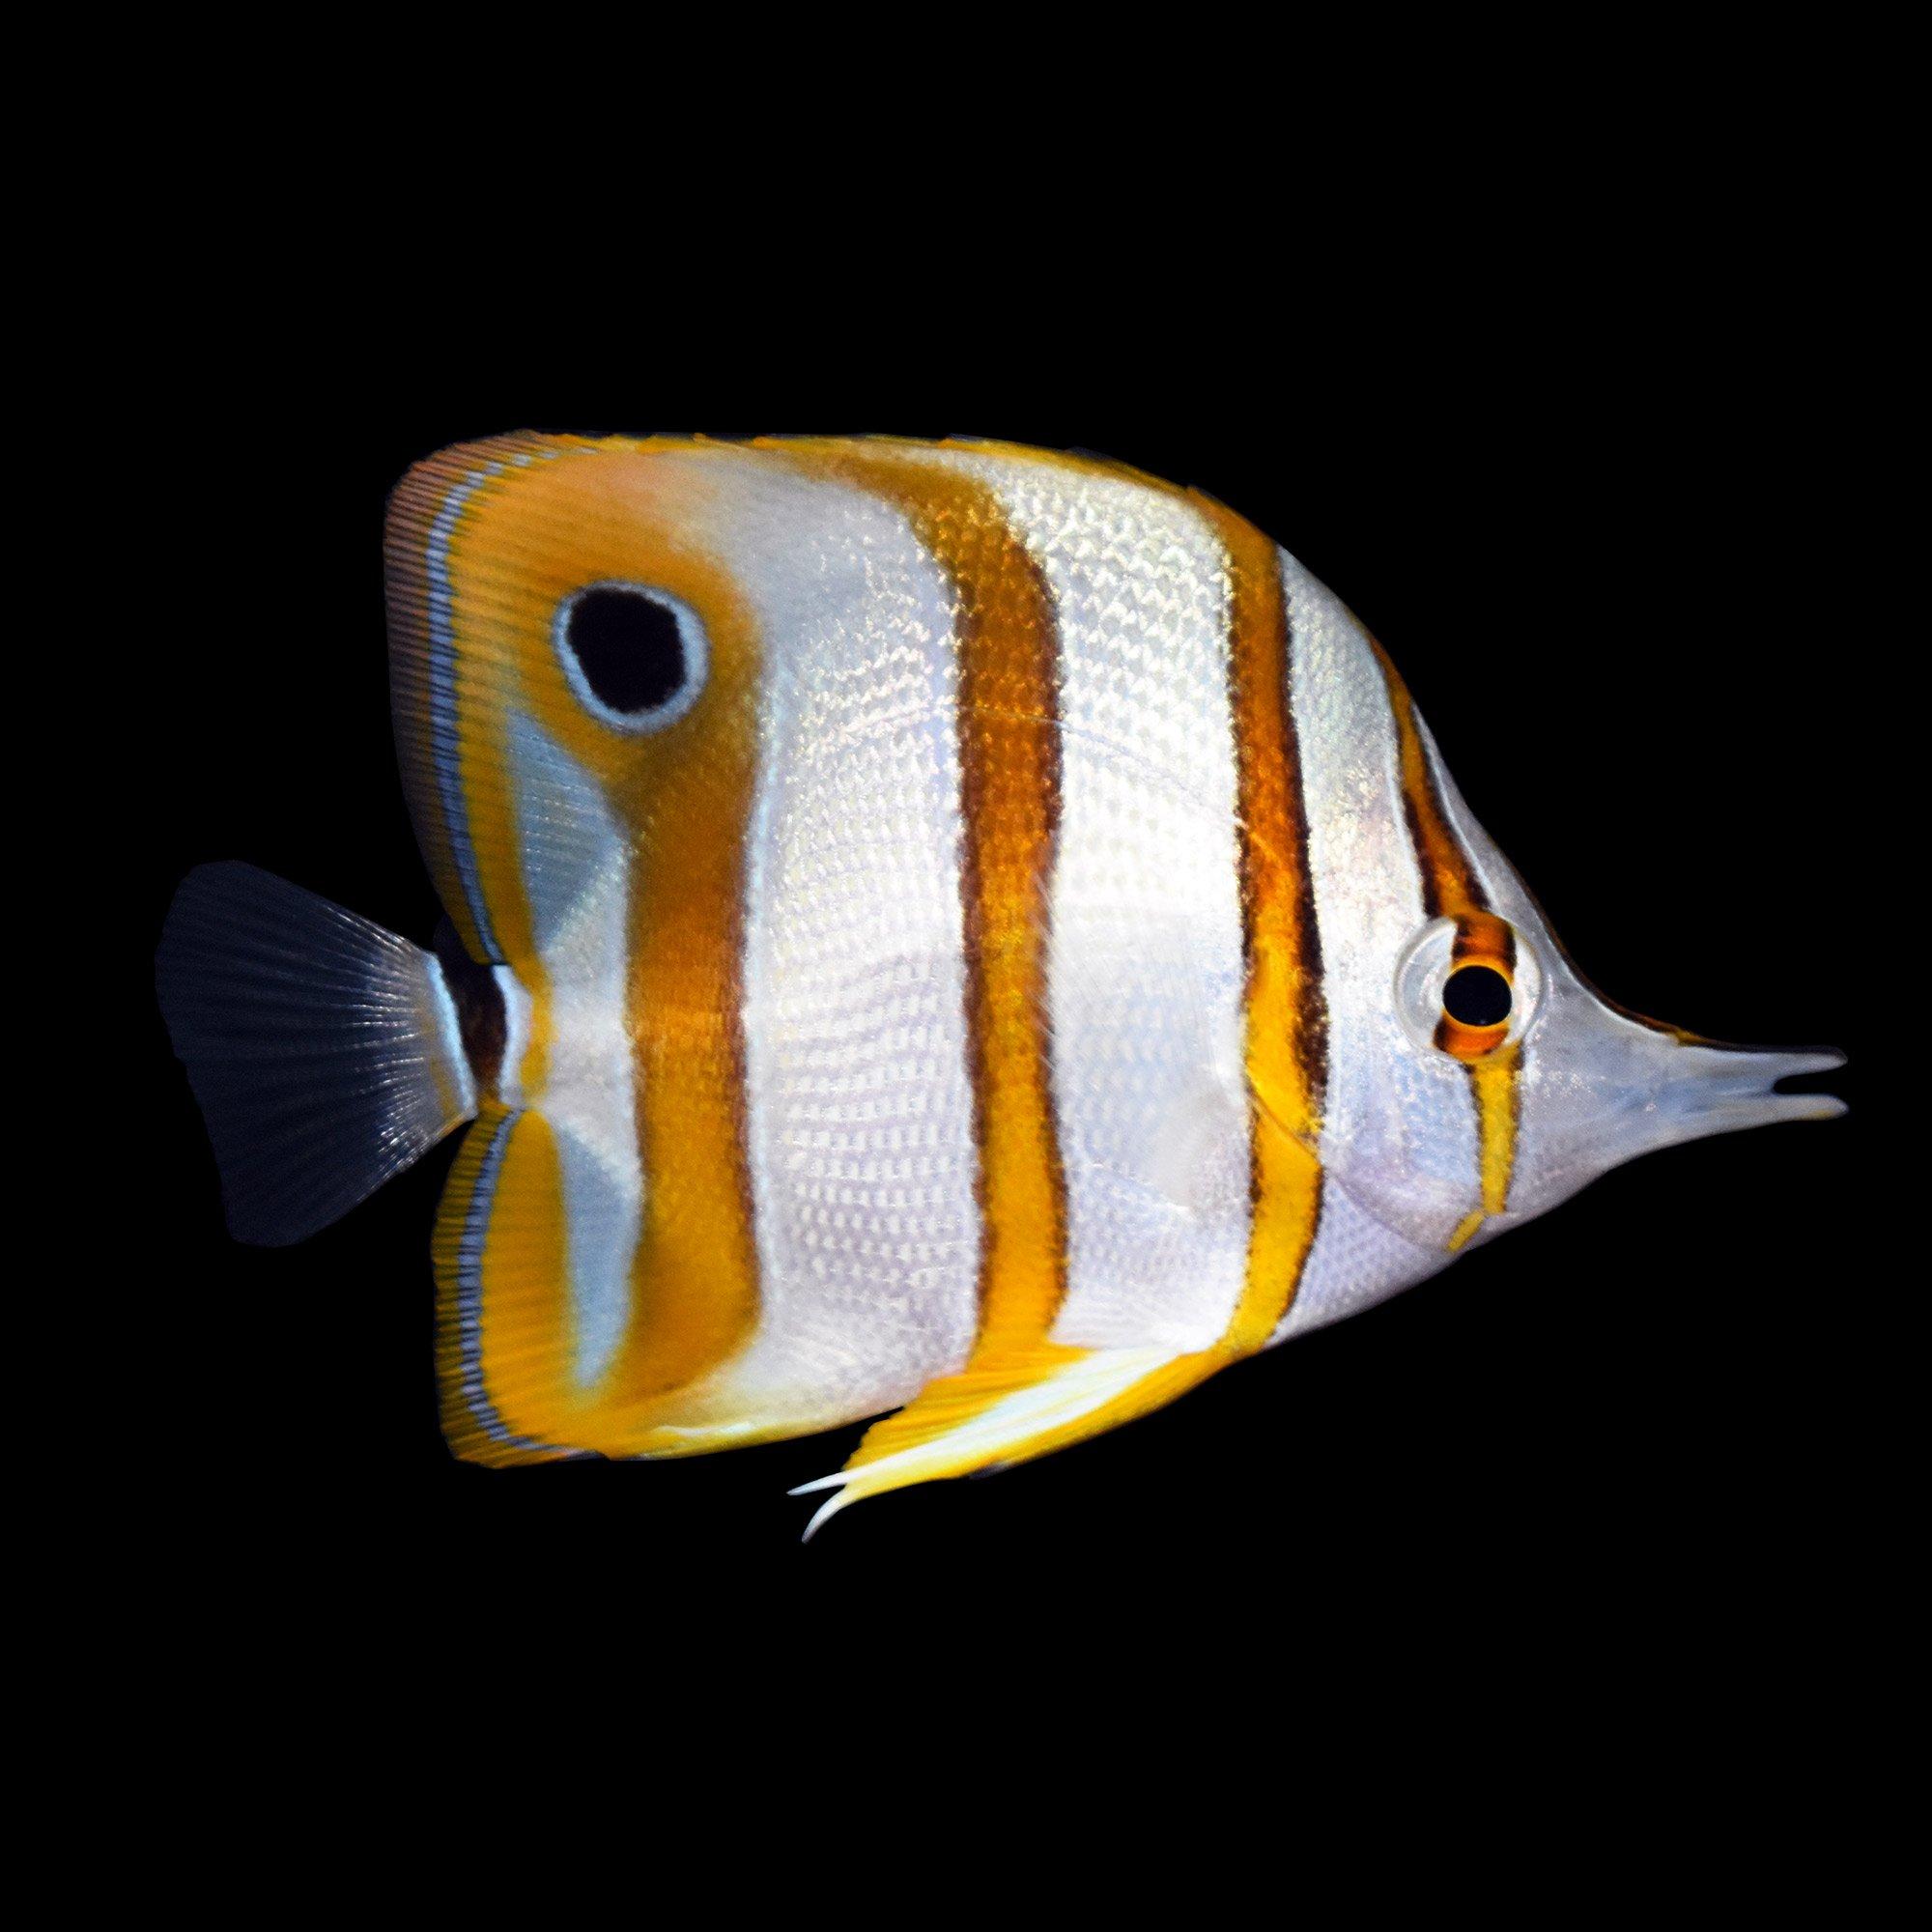 Copperband butterfly copperband butterfly fish petco for Petco fish prices